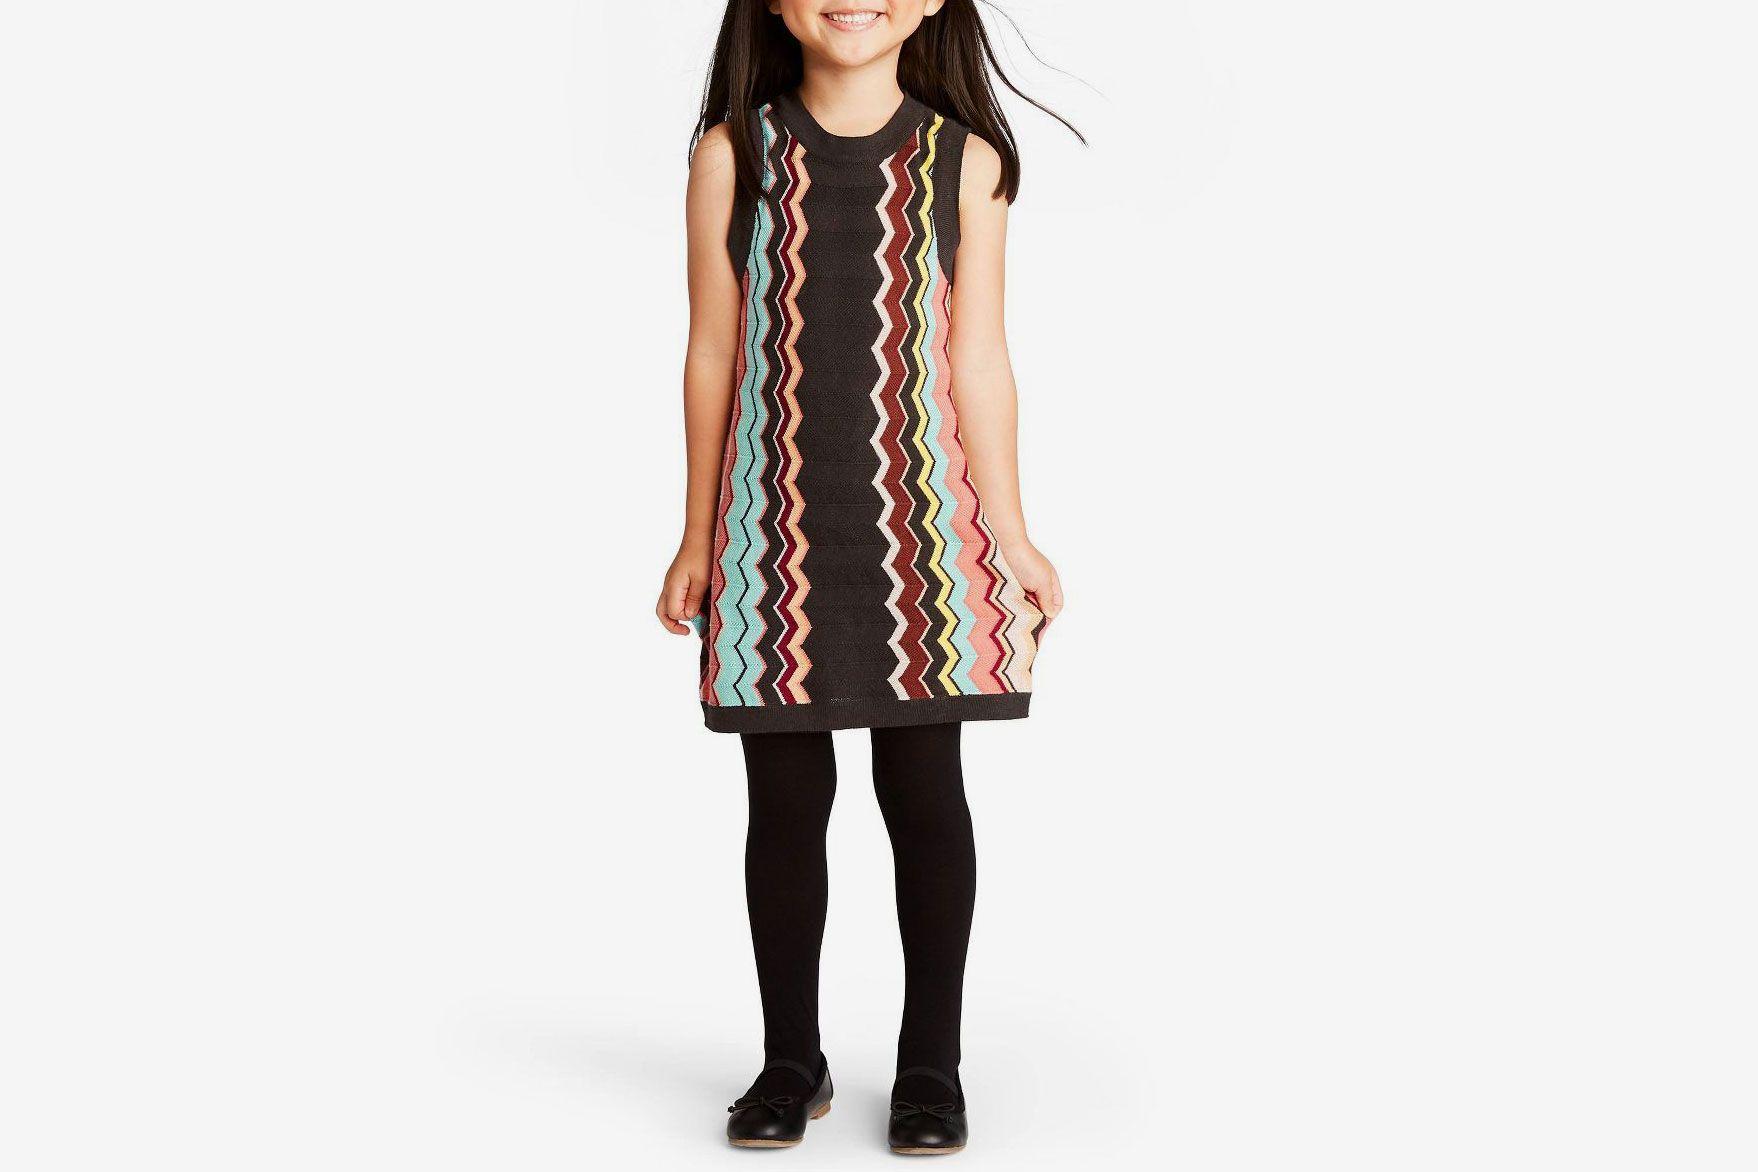 Missoni for Target Toddler Girls' Colore Zig Zag Sleeveless Crewneck Sweater Dress